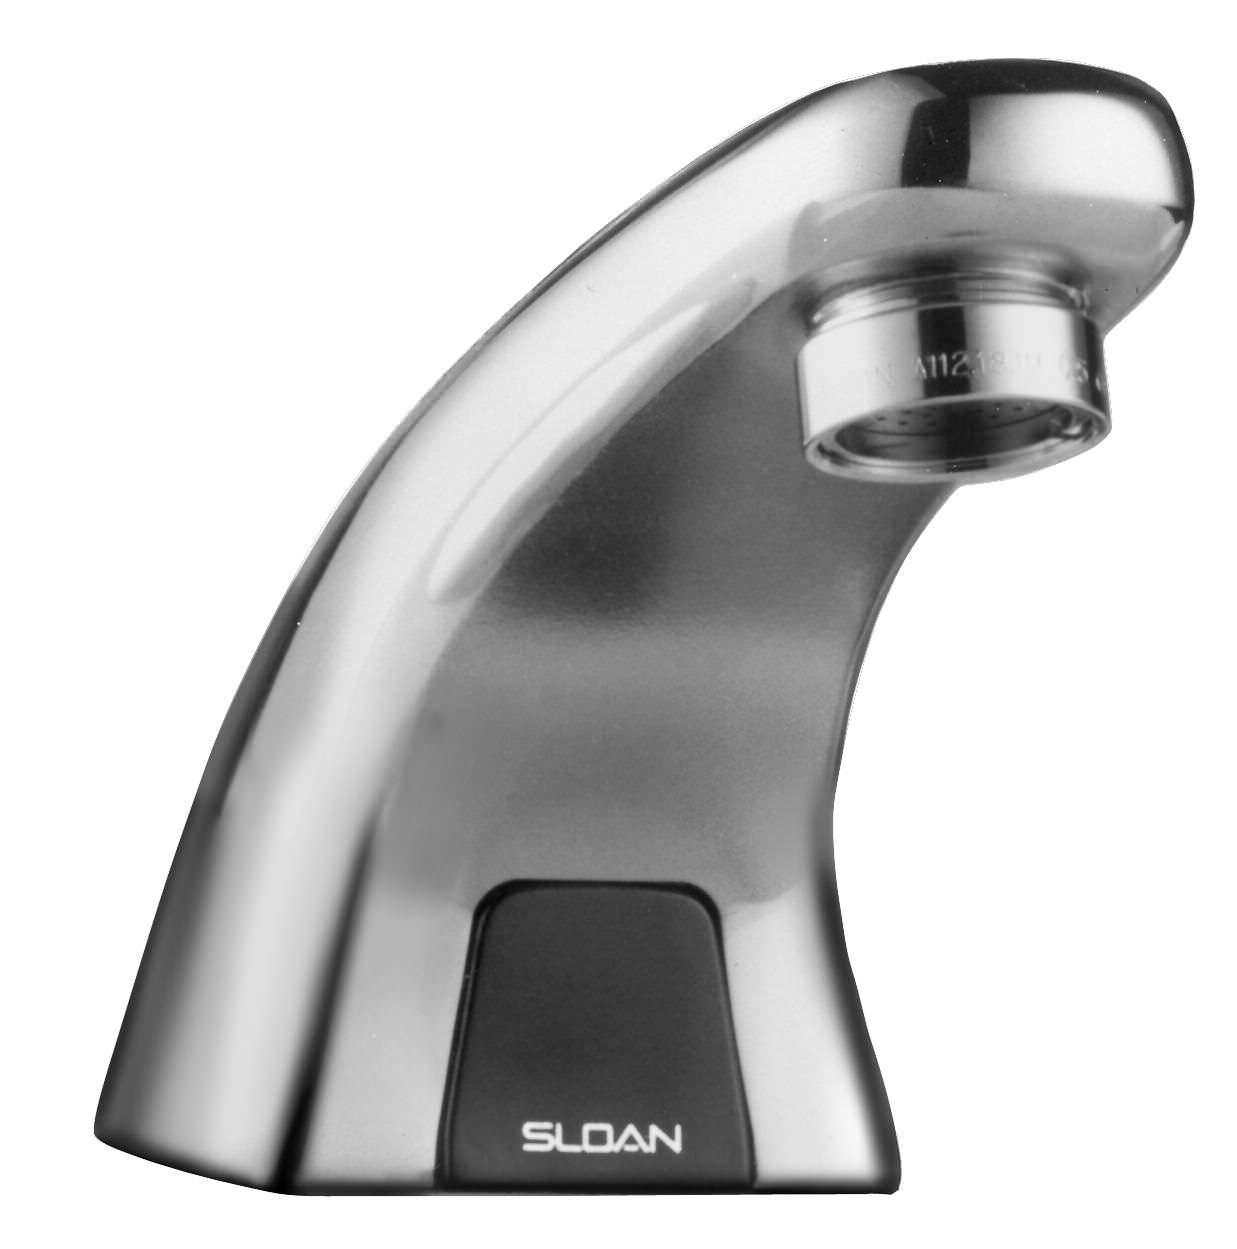 Ideas, sloan faucets battery operated sloan faucets battery operated grupo jenser venta de muebles y equipo para baao sloan faucets 1237 x 1249  .